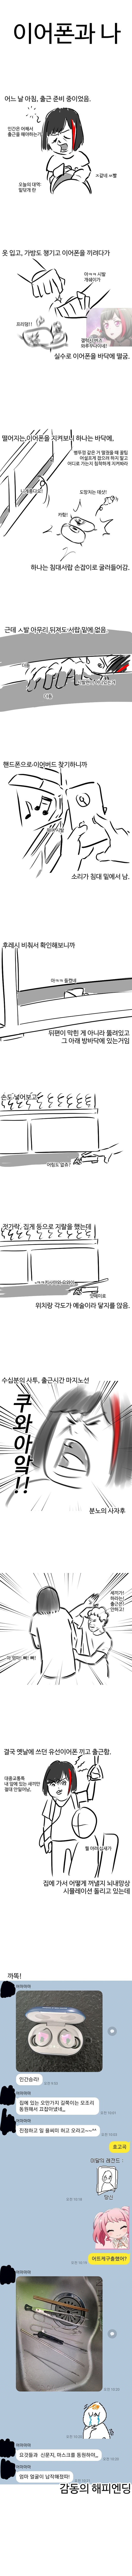 viewimage.php?id=2fbcde21dad62aa36fb2&no=24b0d769e1d32ca73fec8ffa11d0283194eeae3ea3f7d0da351cf9d3408370133a730842658d9515e5265d6cb0b29fc88a04febef0a2edd02e1287d238f2862261c0792aac5f931efe42824b35d01bc186c3acf91f5ae5ae2f1e21139ca2937ec390a595bc5e408a2e61ab89a13f24dccf78da4d22b0aa